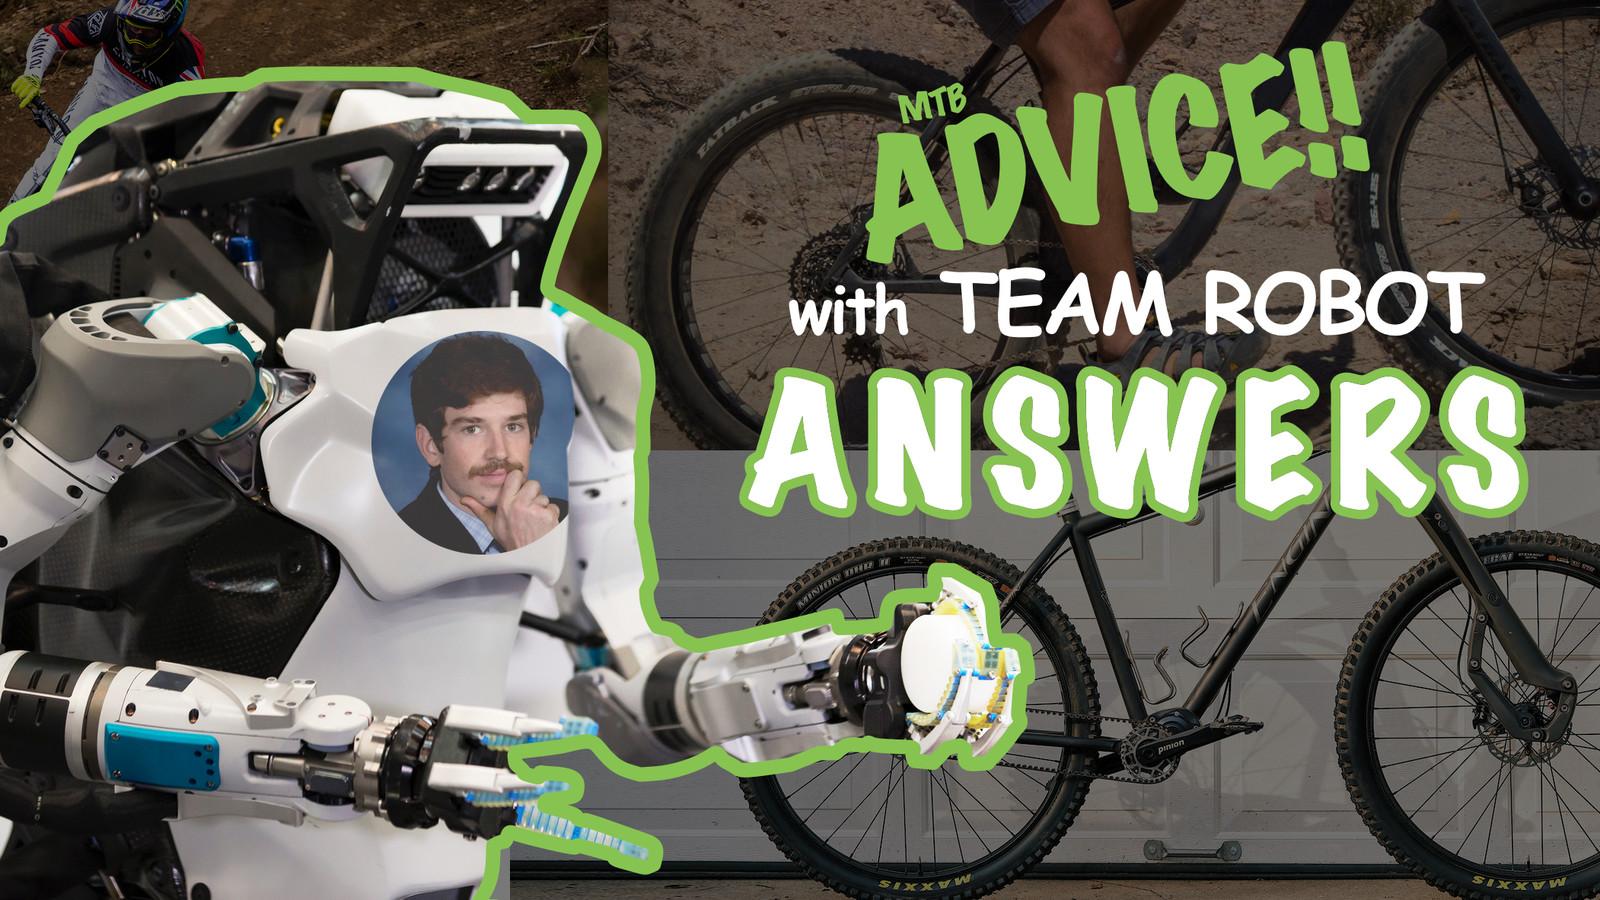 MTB ADVICE!! with Team Robot - ANSWERS #1